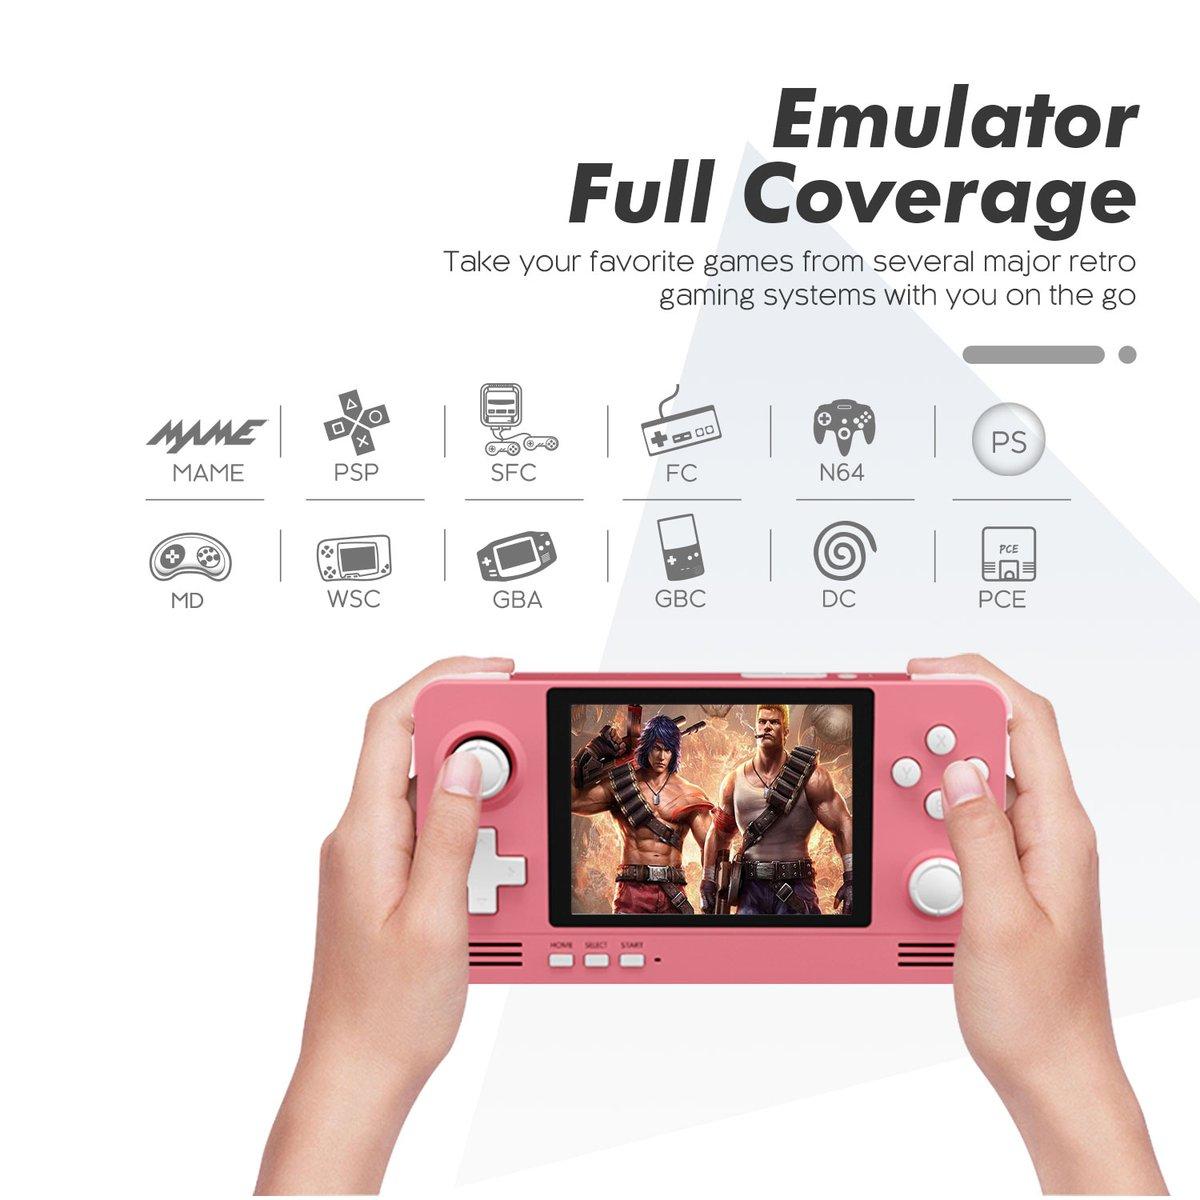 Retroid Pocket 2 Handheld Retro Gaming System GBA GBC PSP N64